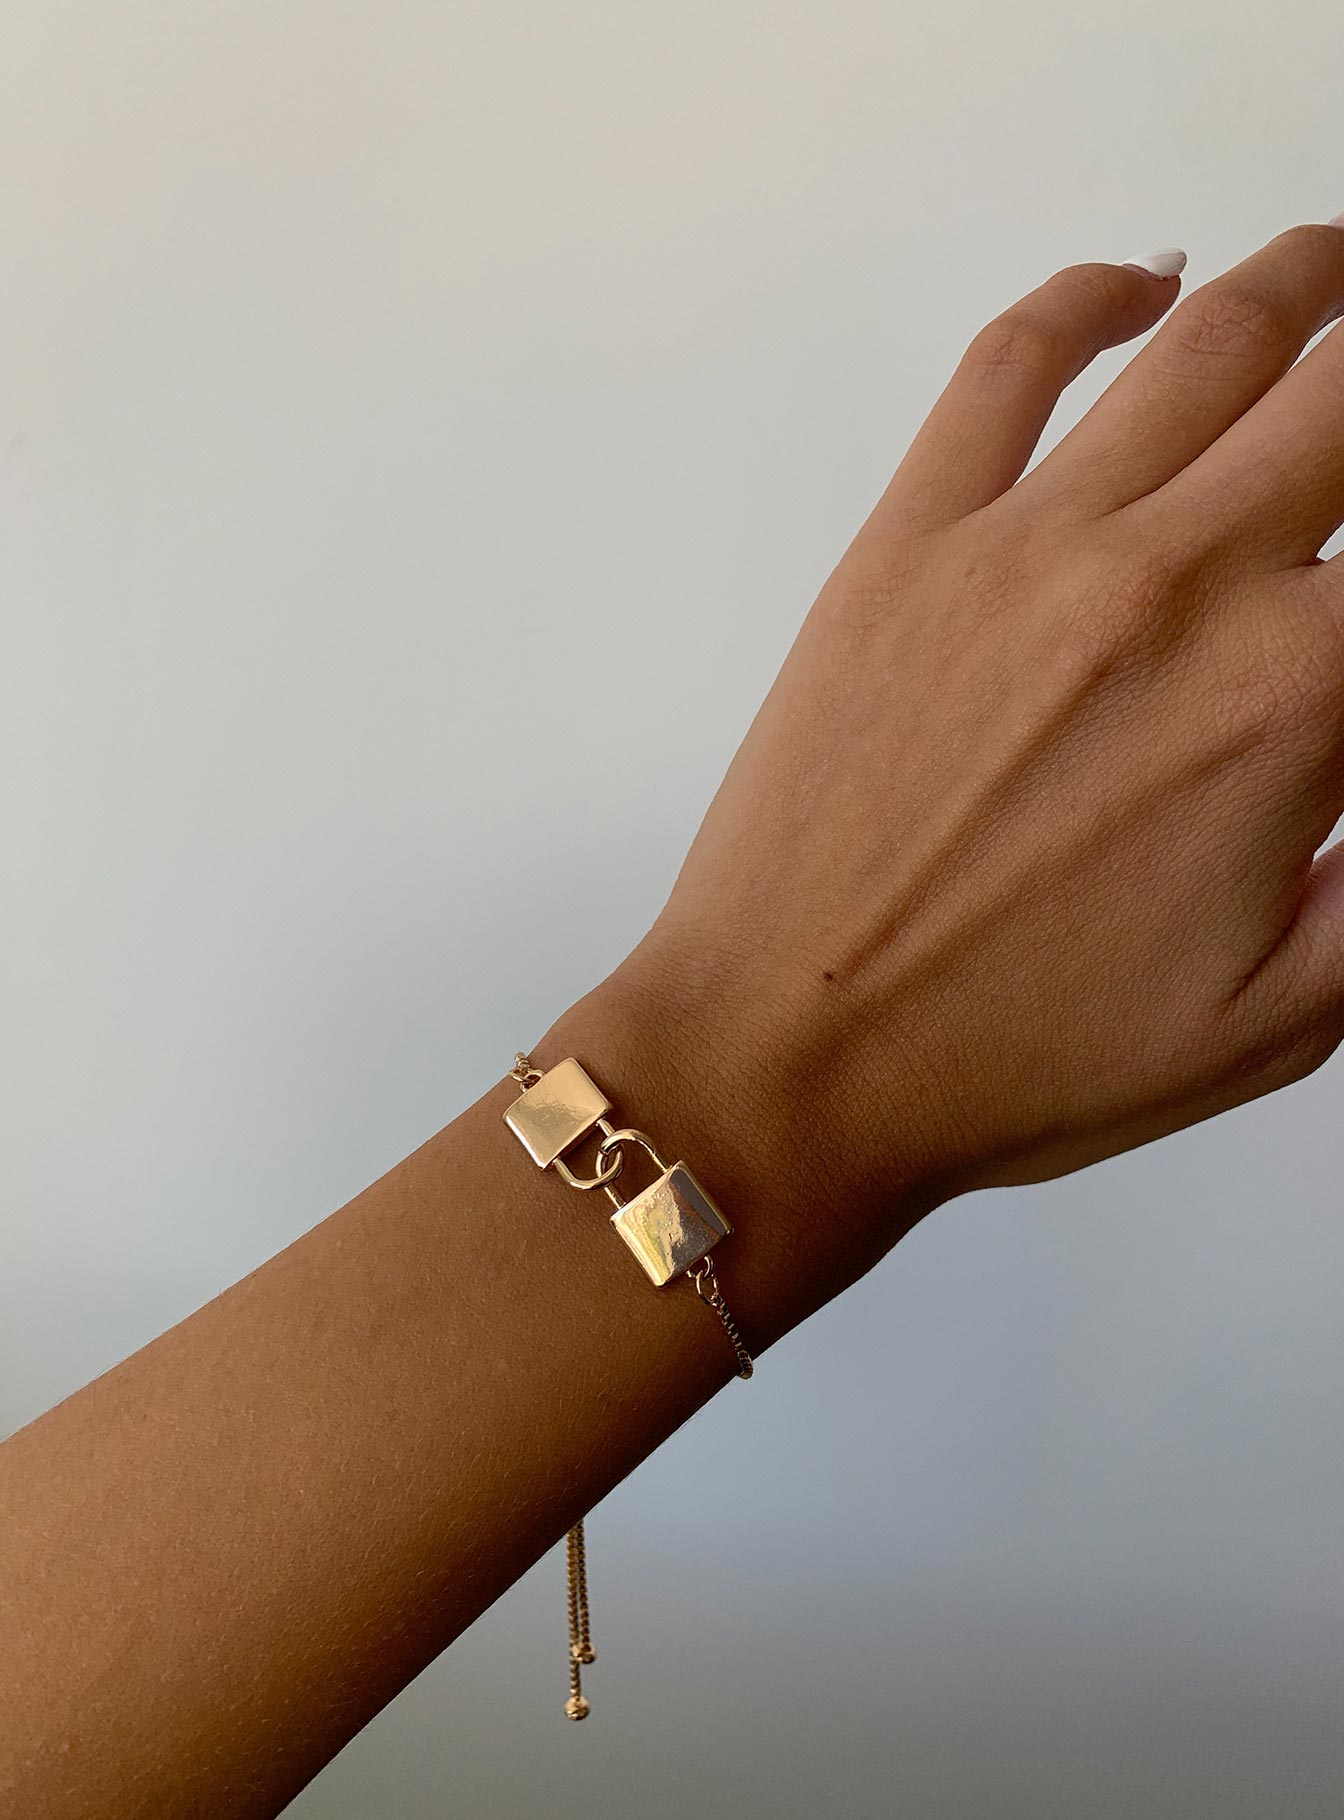 Bracelets & Cuffs (Side A)